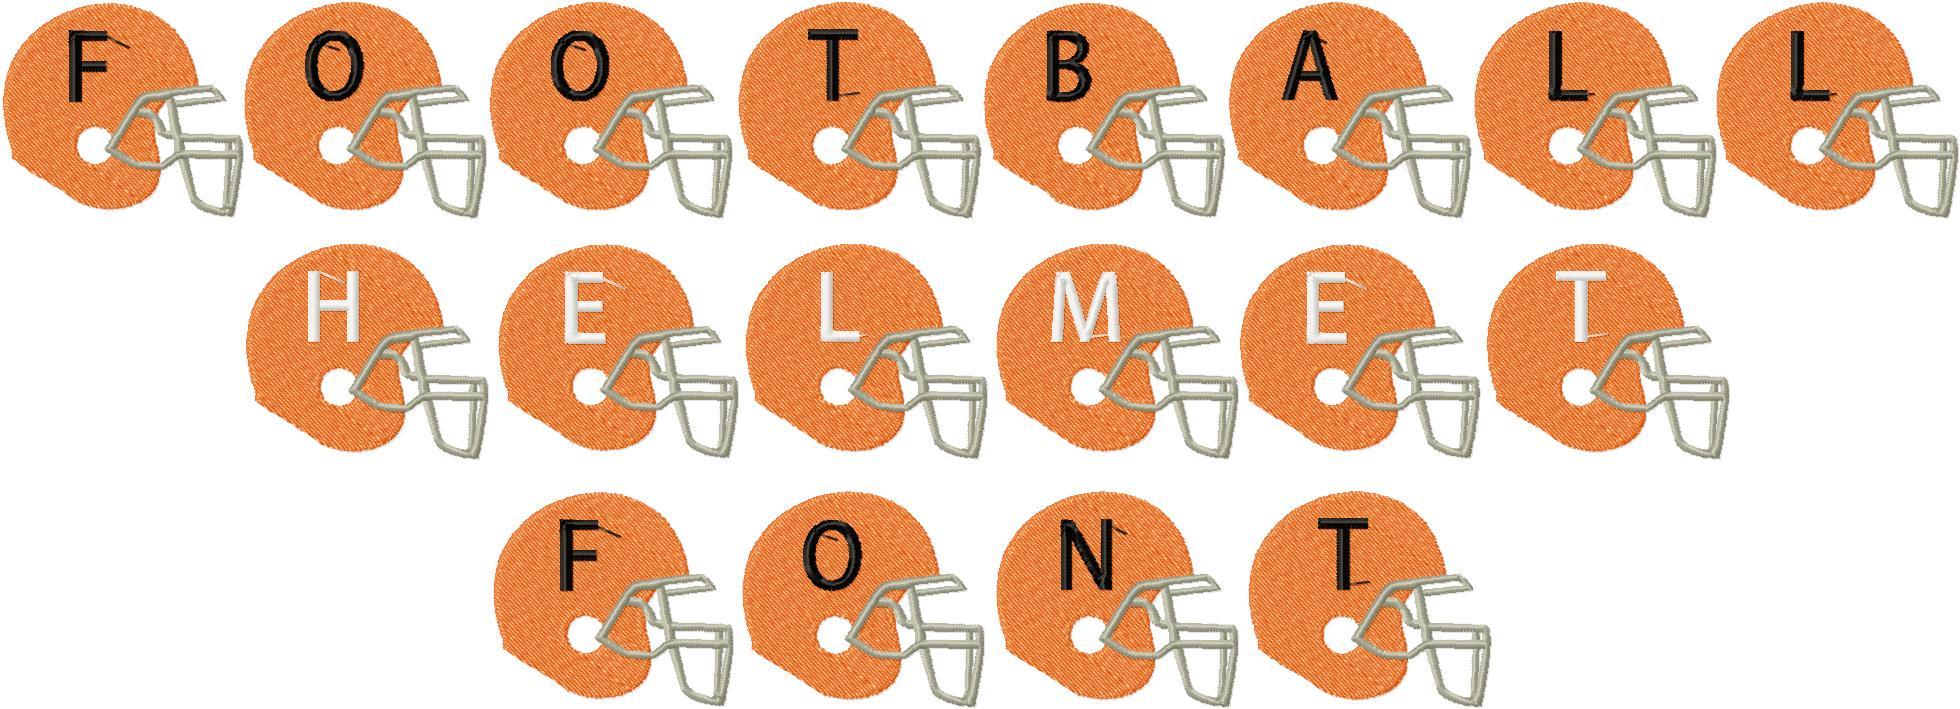 14 Football Alphabet Font Images - Football Letters Font ...